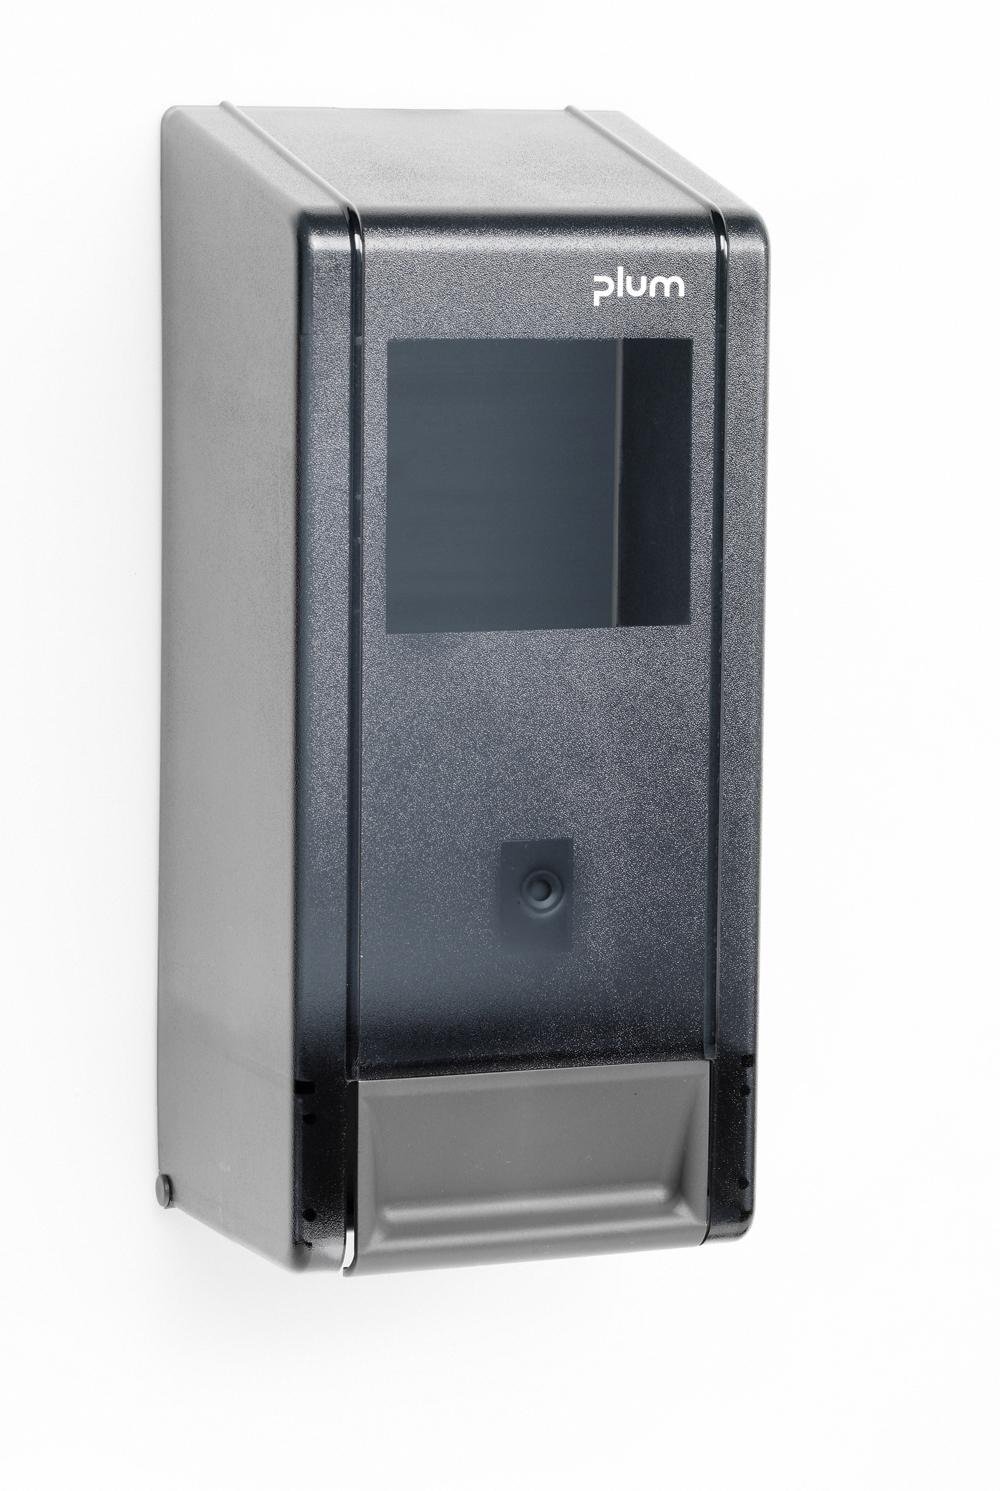 Dispenser Plum MP 2000 modul 1